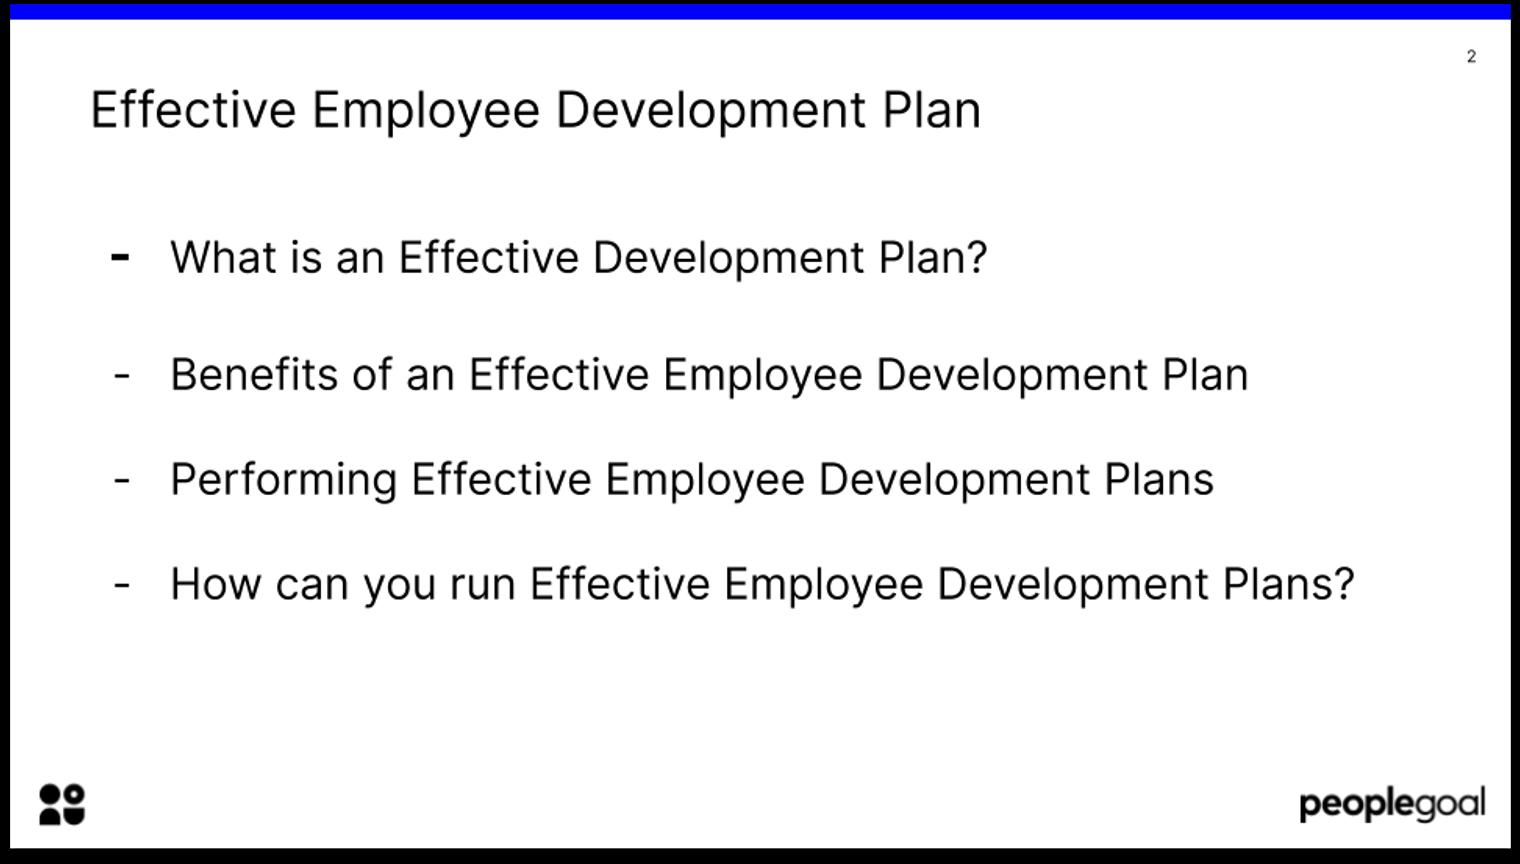 Effective Employee Development Plans introduction